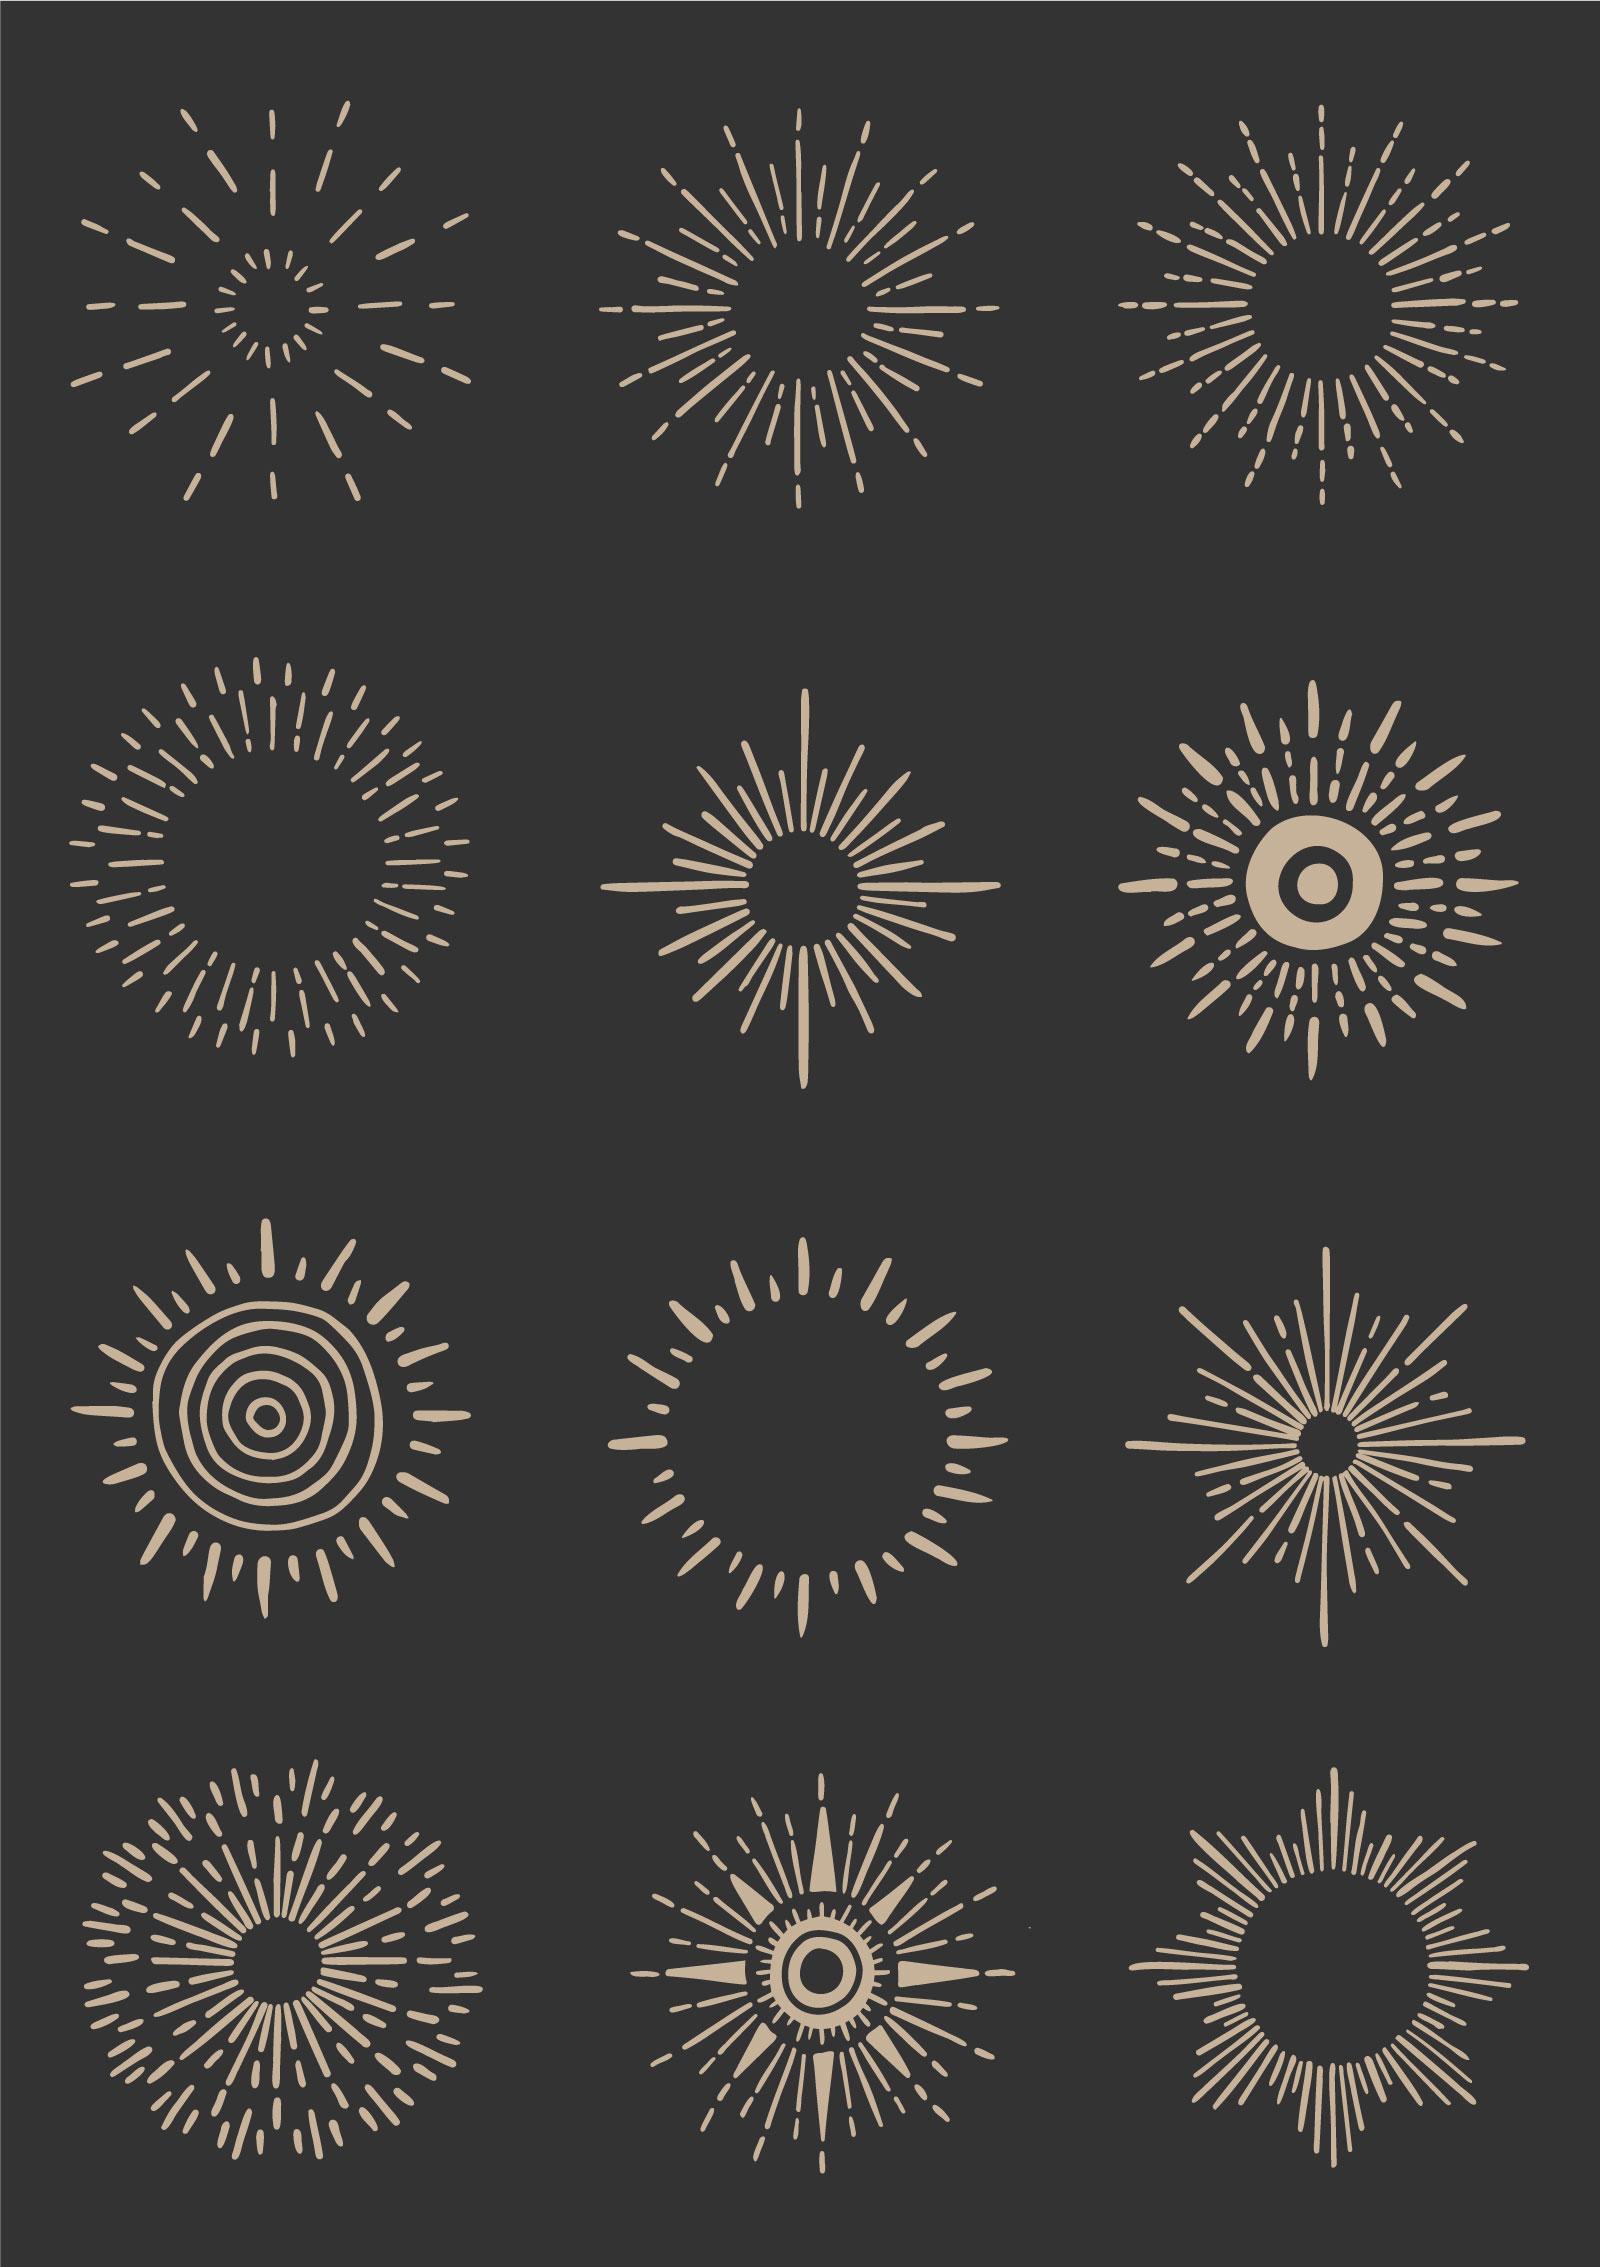 Hand-drawn Vector Sunbursts and Sunrays